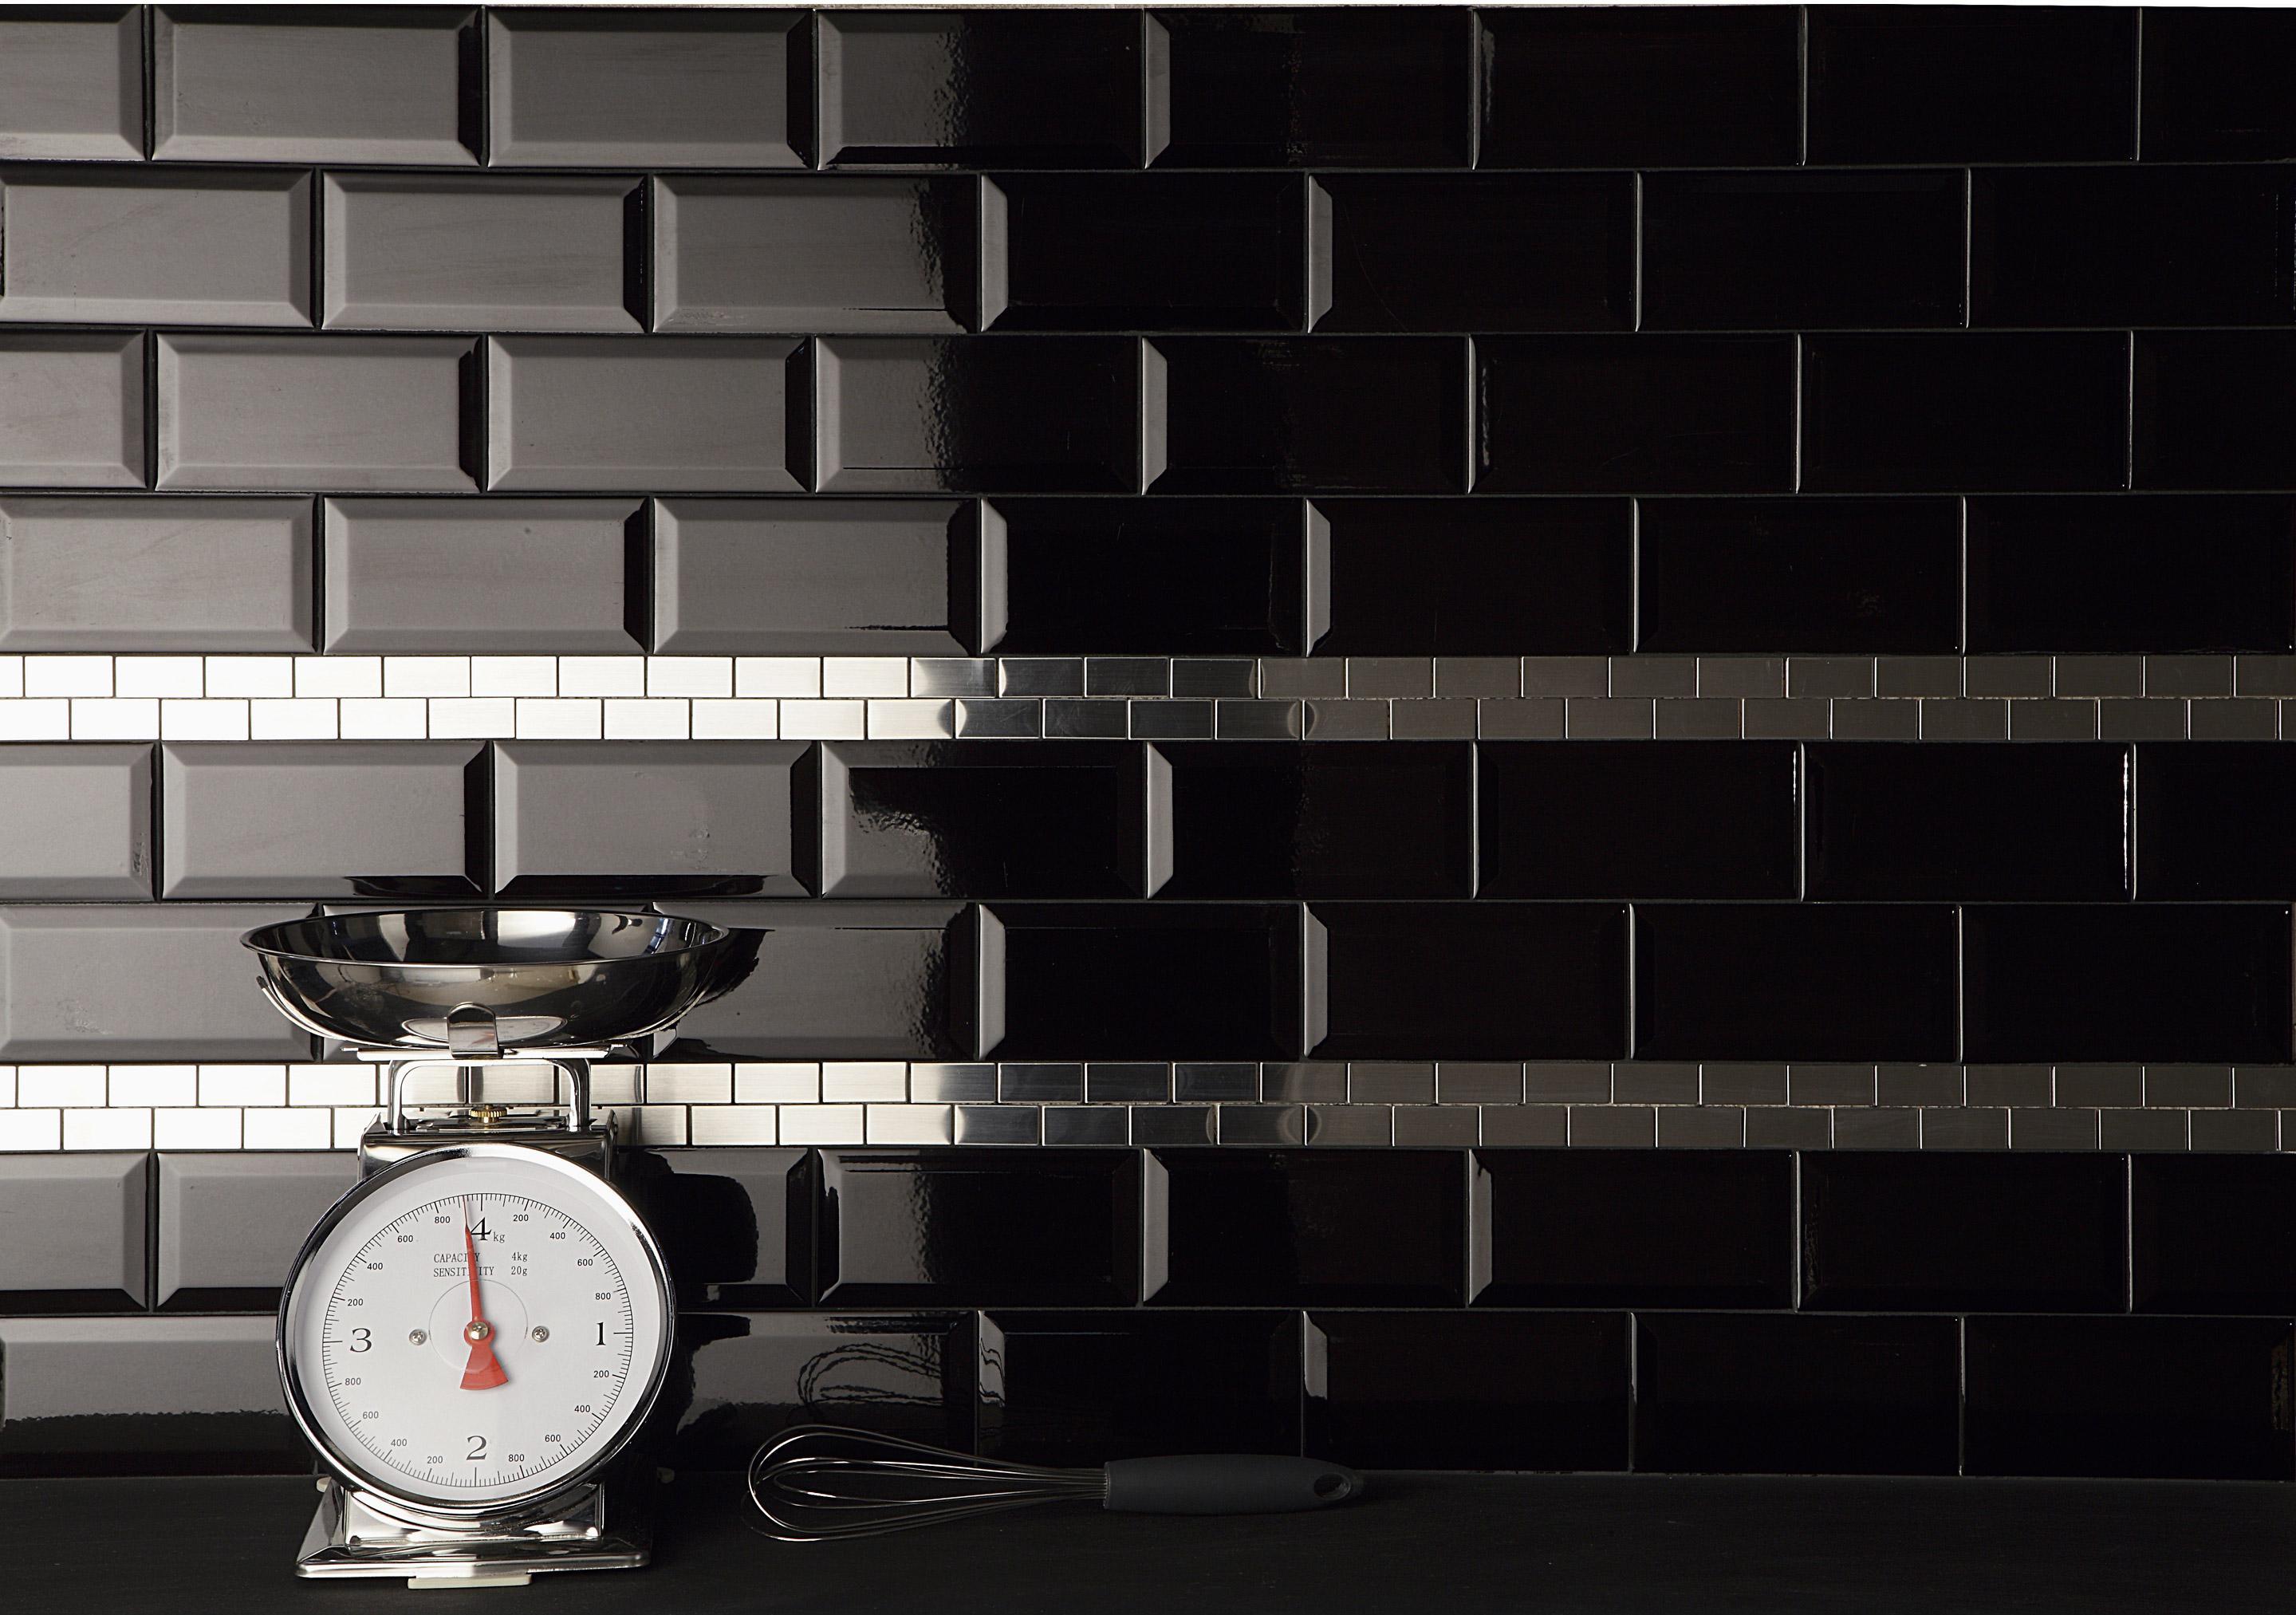 Carrelage mur uni noir brillante l.7.5 x L.15 cm, Metro EL BARCO